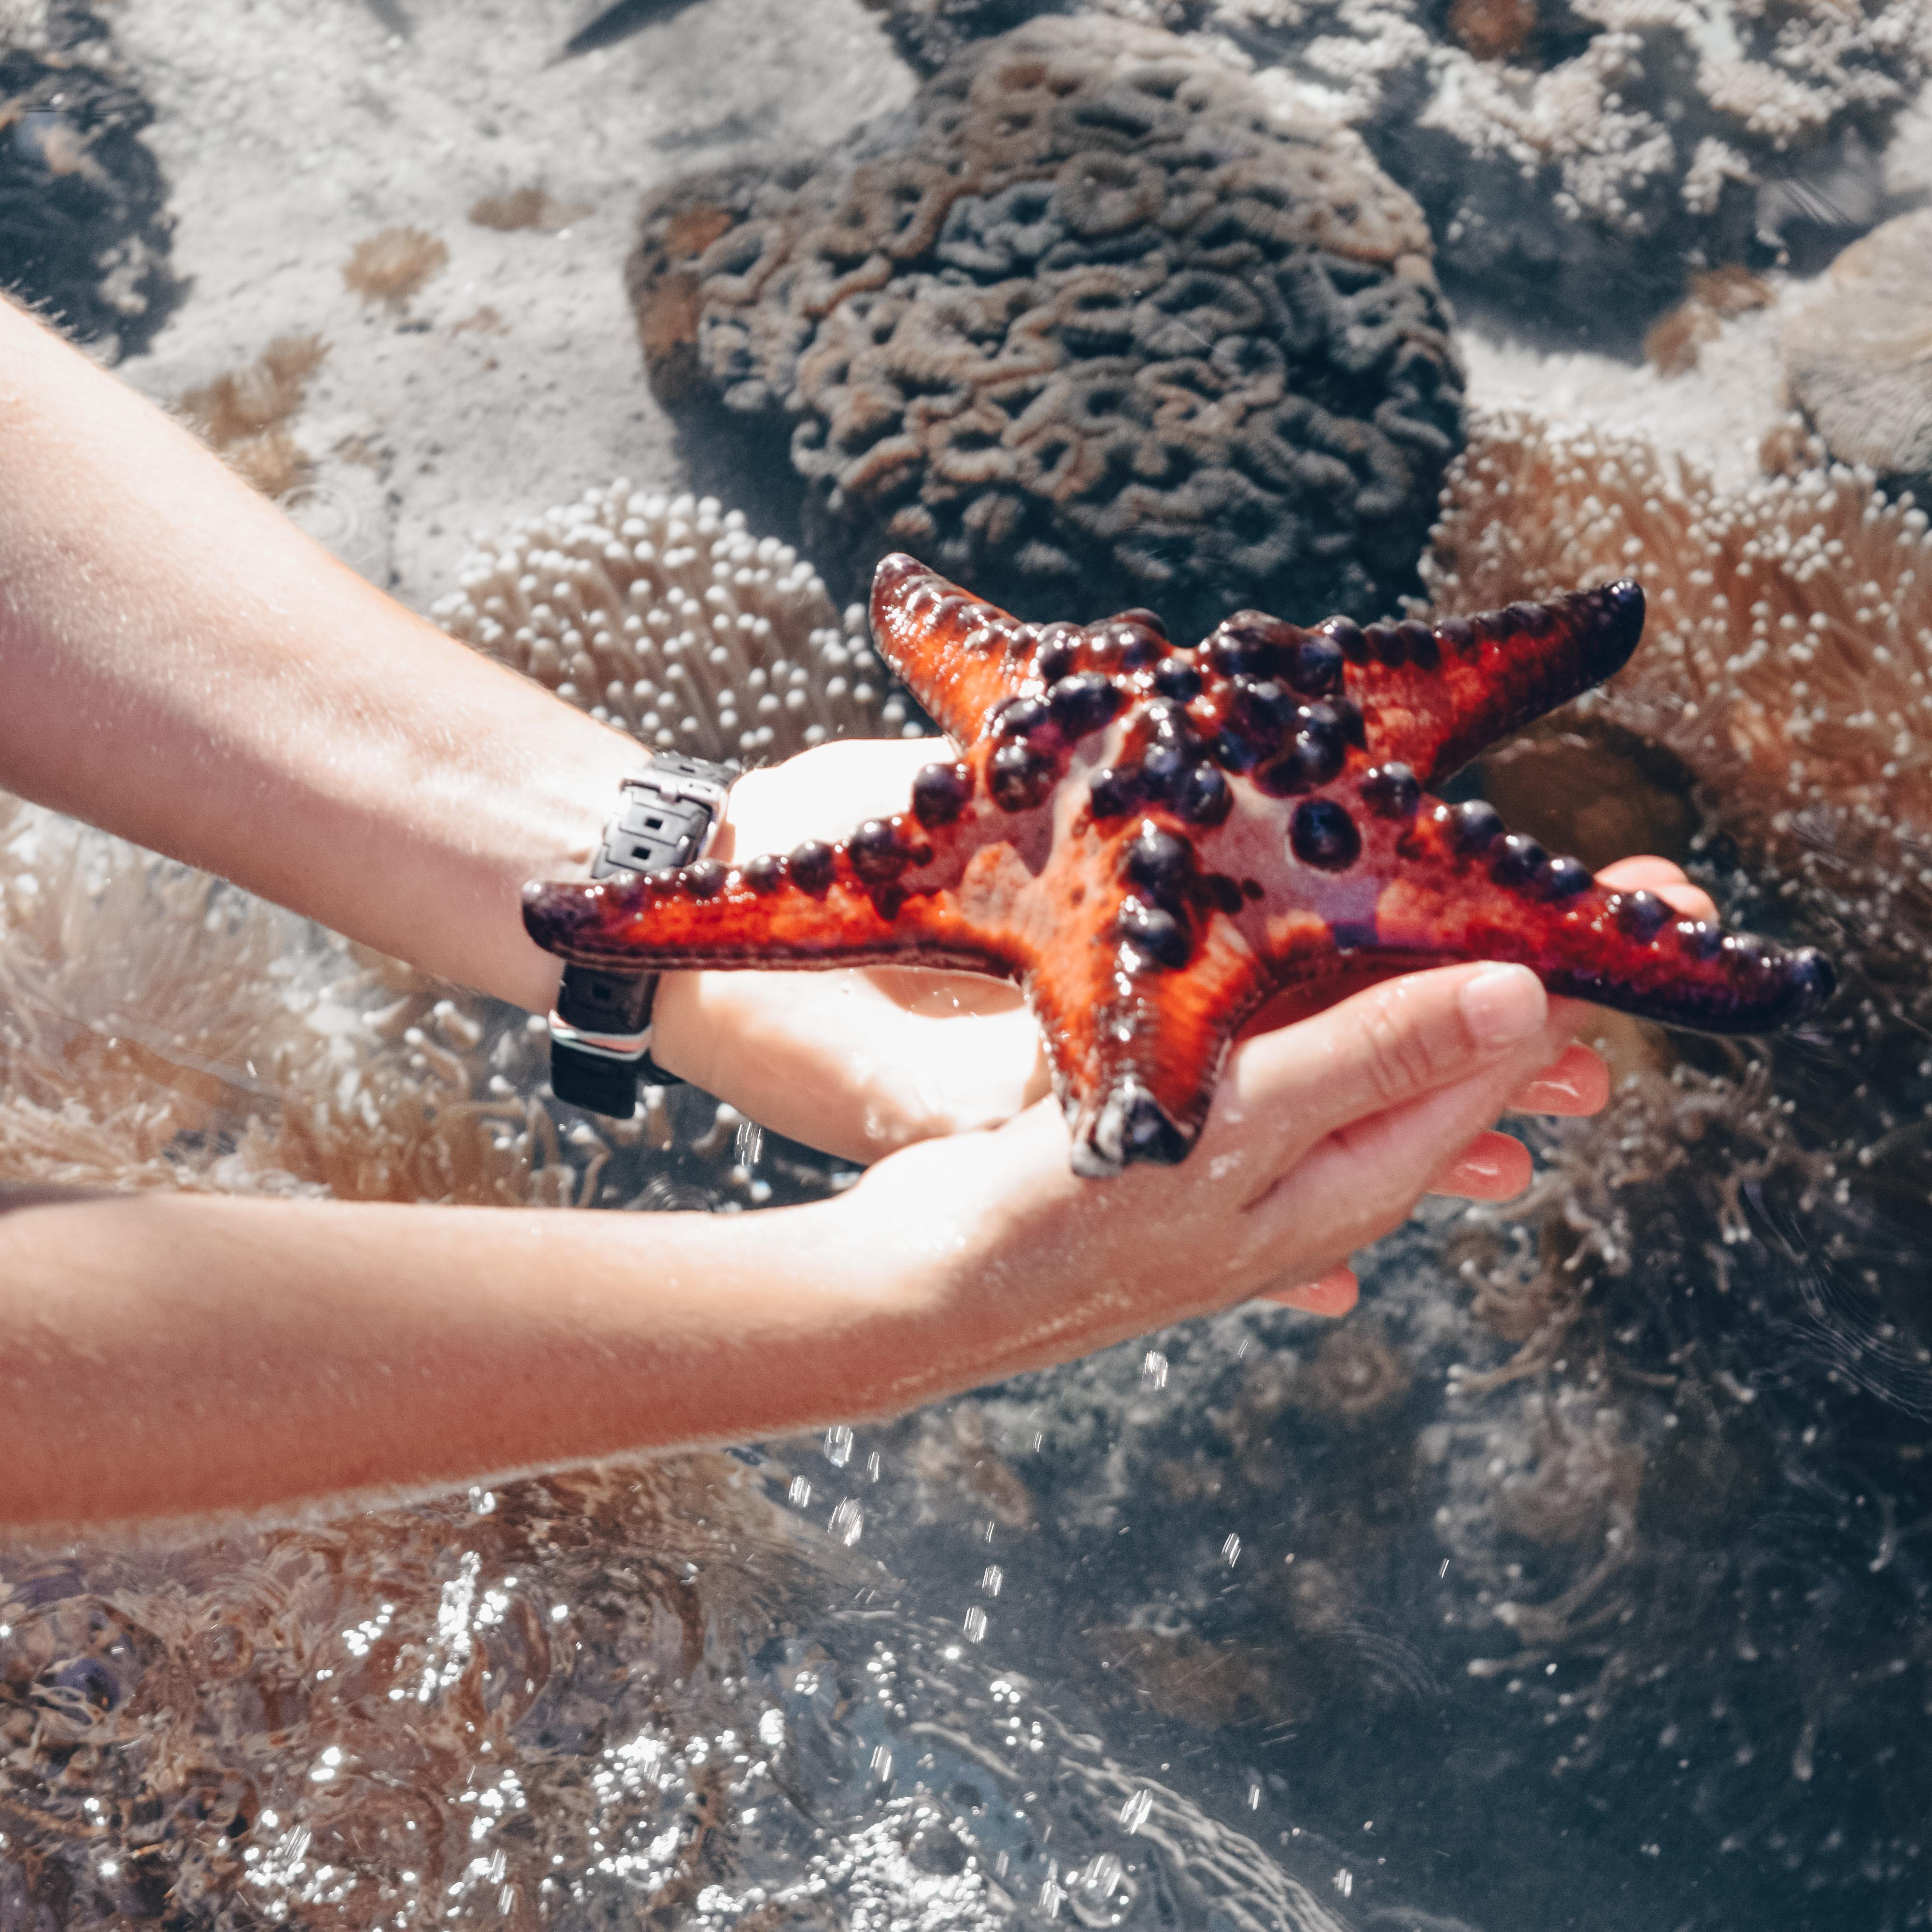 Hands holding a starfish to illustrate the South Carolina Aquarium